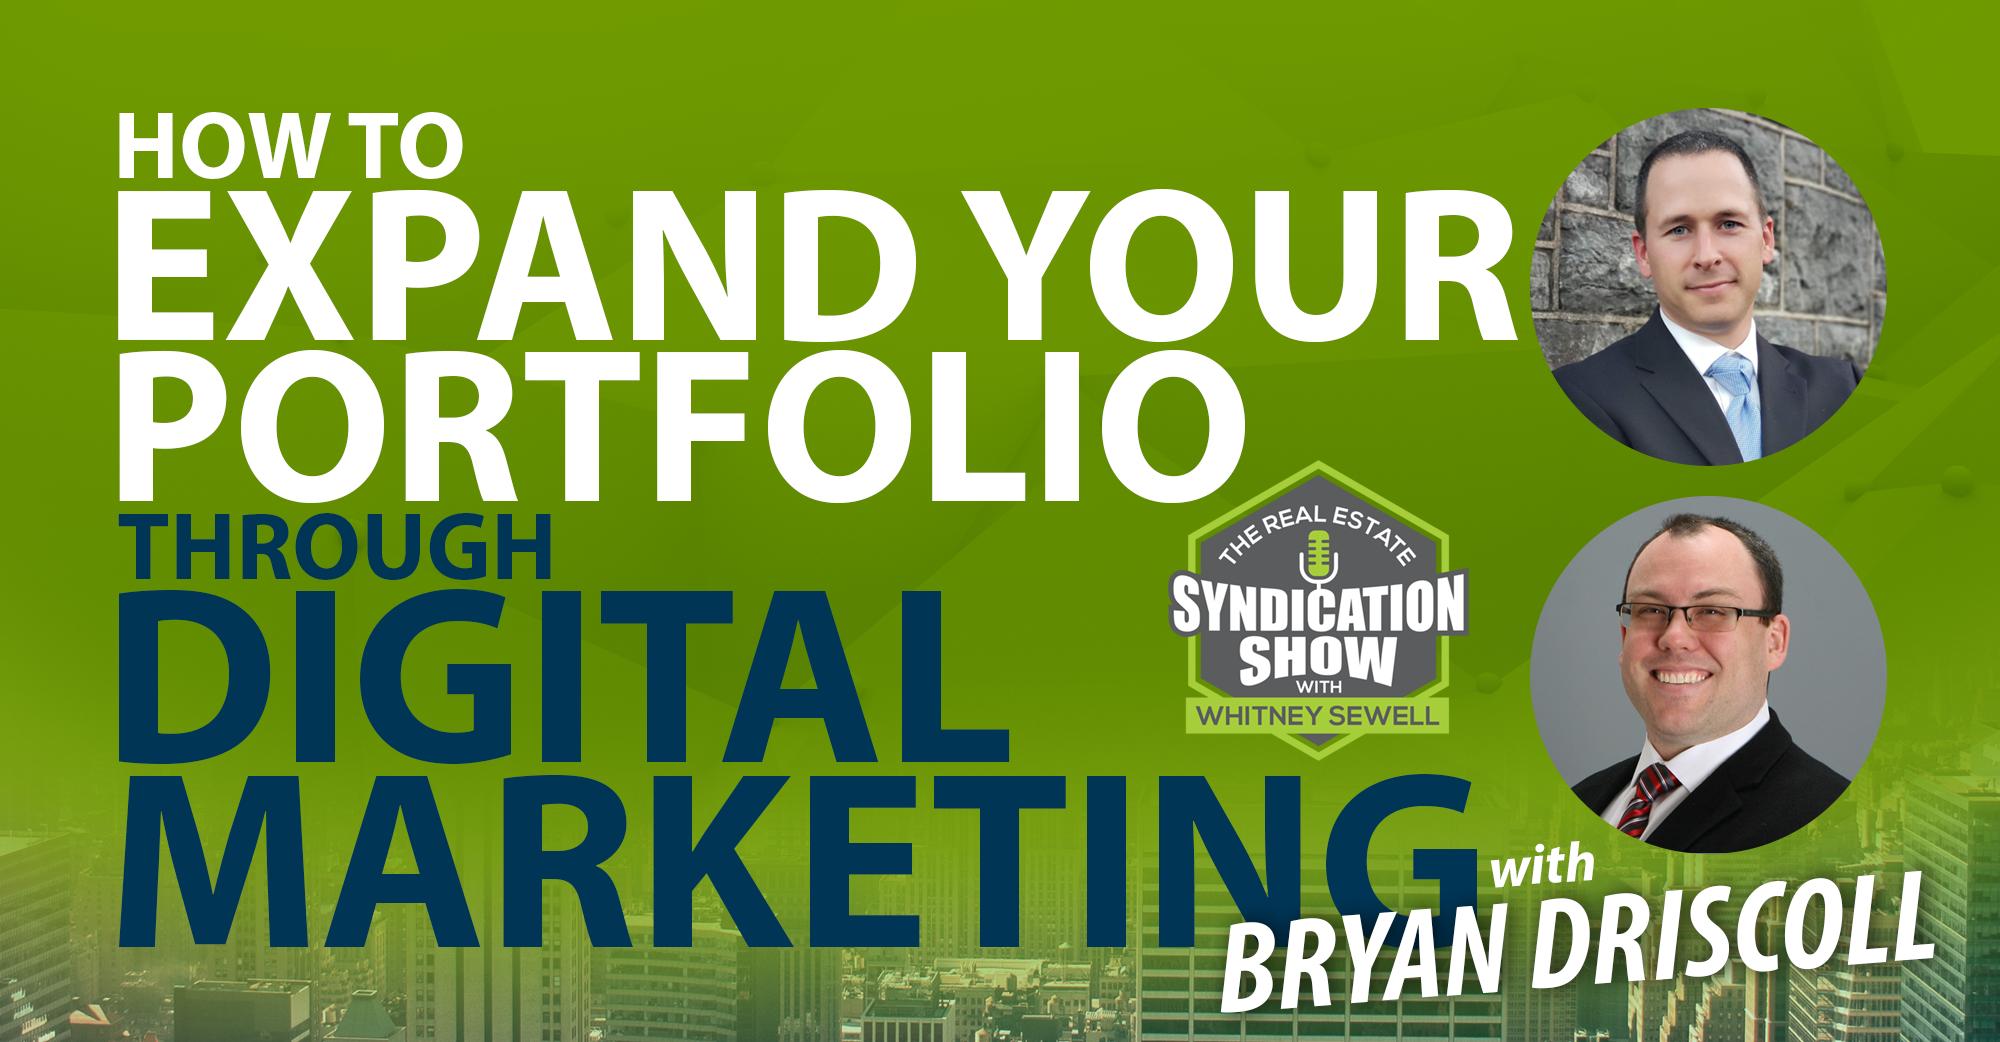 How to Expand Your Portfolio Through Digital Marketing with Brian Driscoll